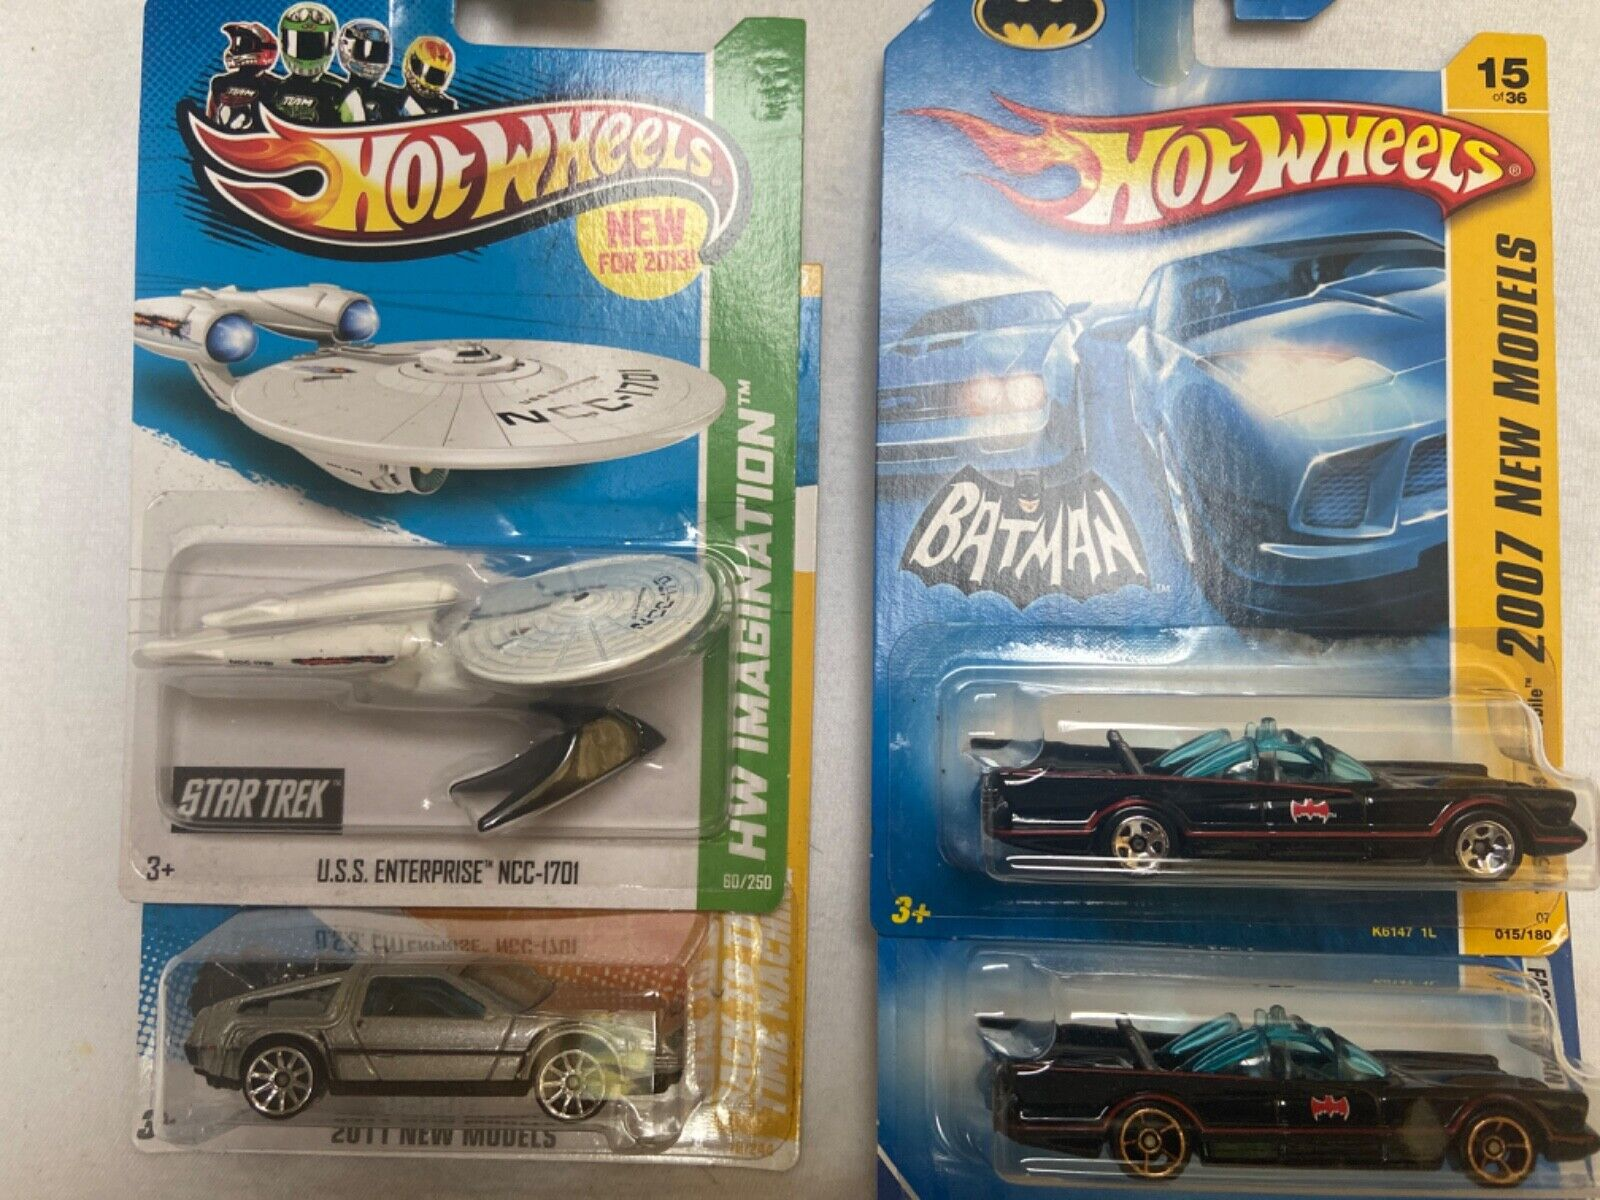 HOT WHEELS Back To The Future DeLorean, Batman Original 66 Batmobile, Star Trek - $5.99